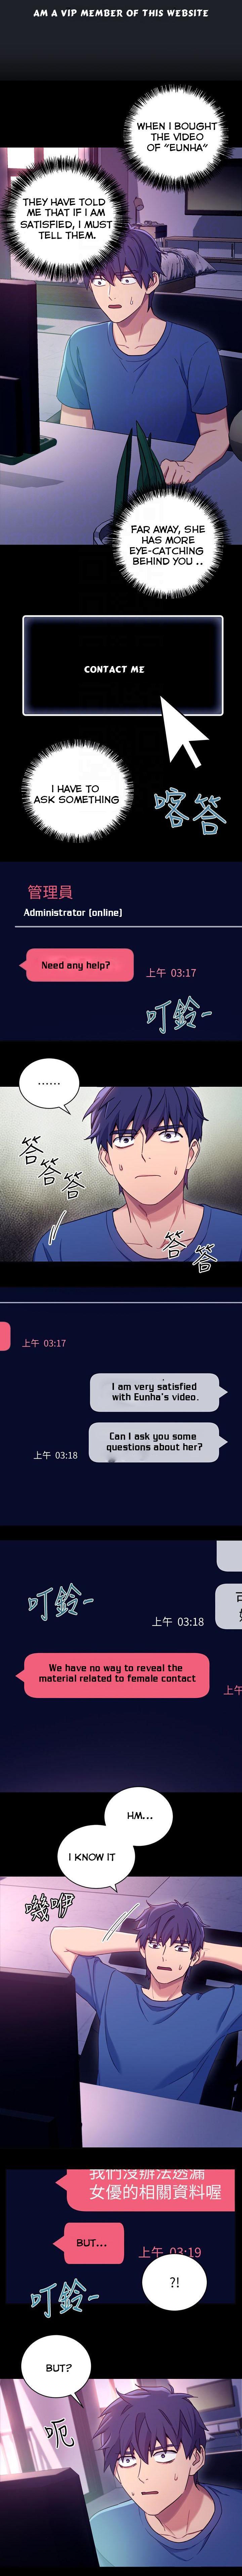 [Neck Pilllow] Stepmother Friends Ch.39/? [English] [Hentai Universe] NEW! 13/10/2020 84